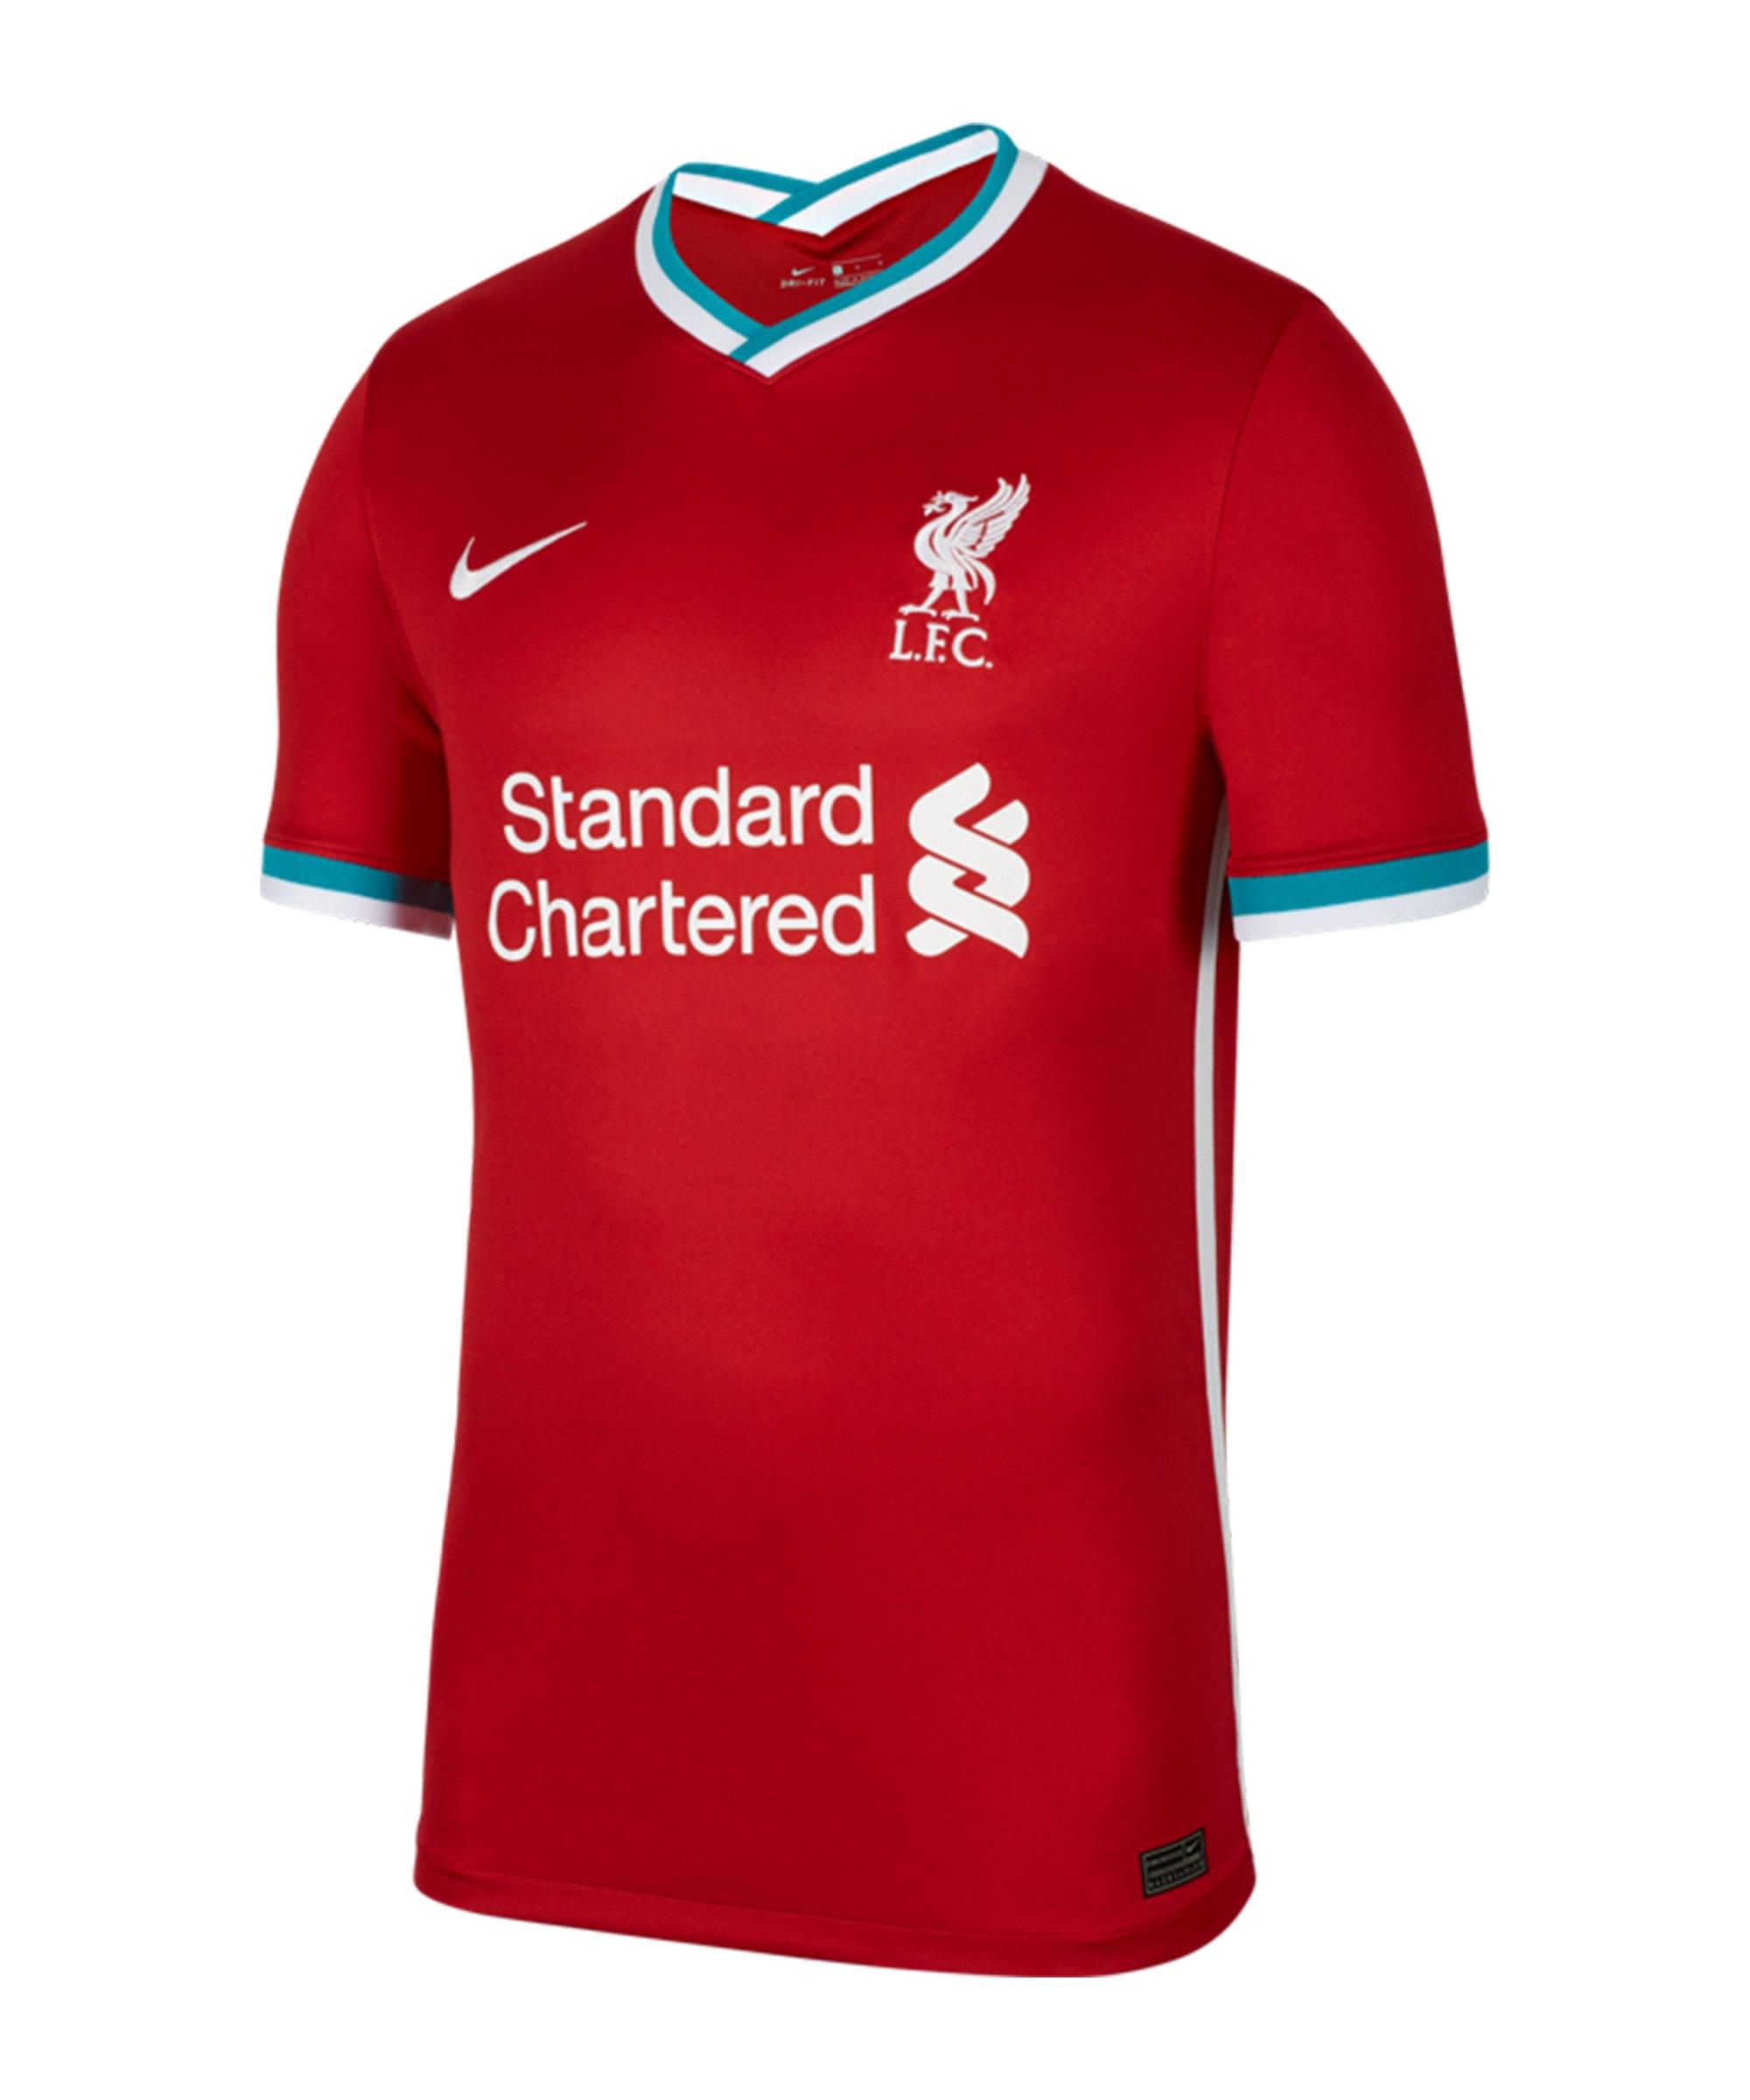 Nike FC Liverpool Trikot Home 2020/2021 Rot F687 - rot